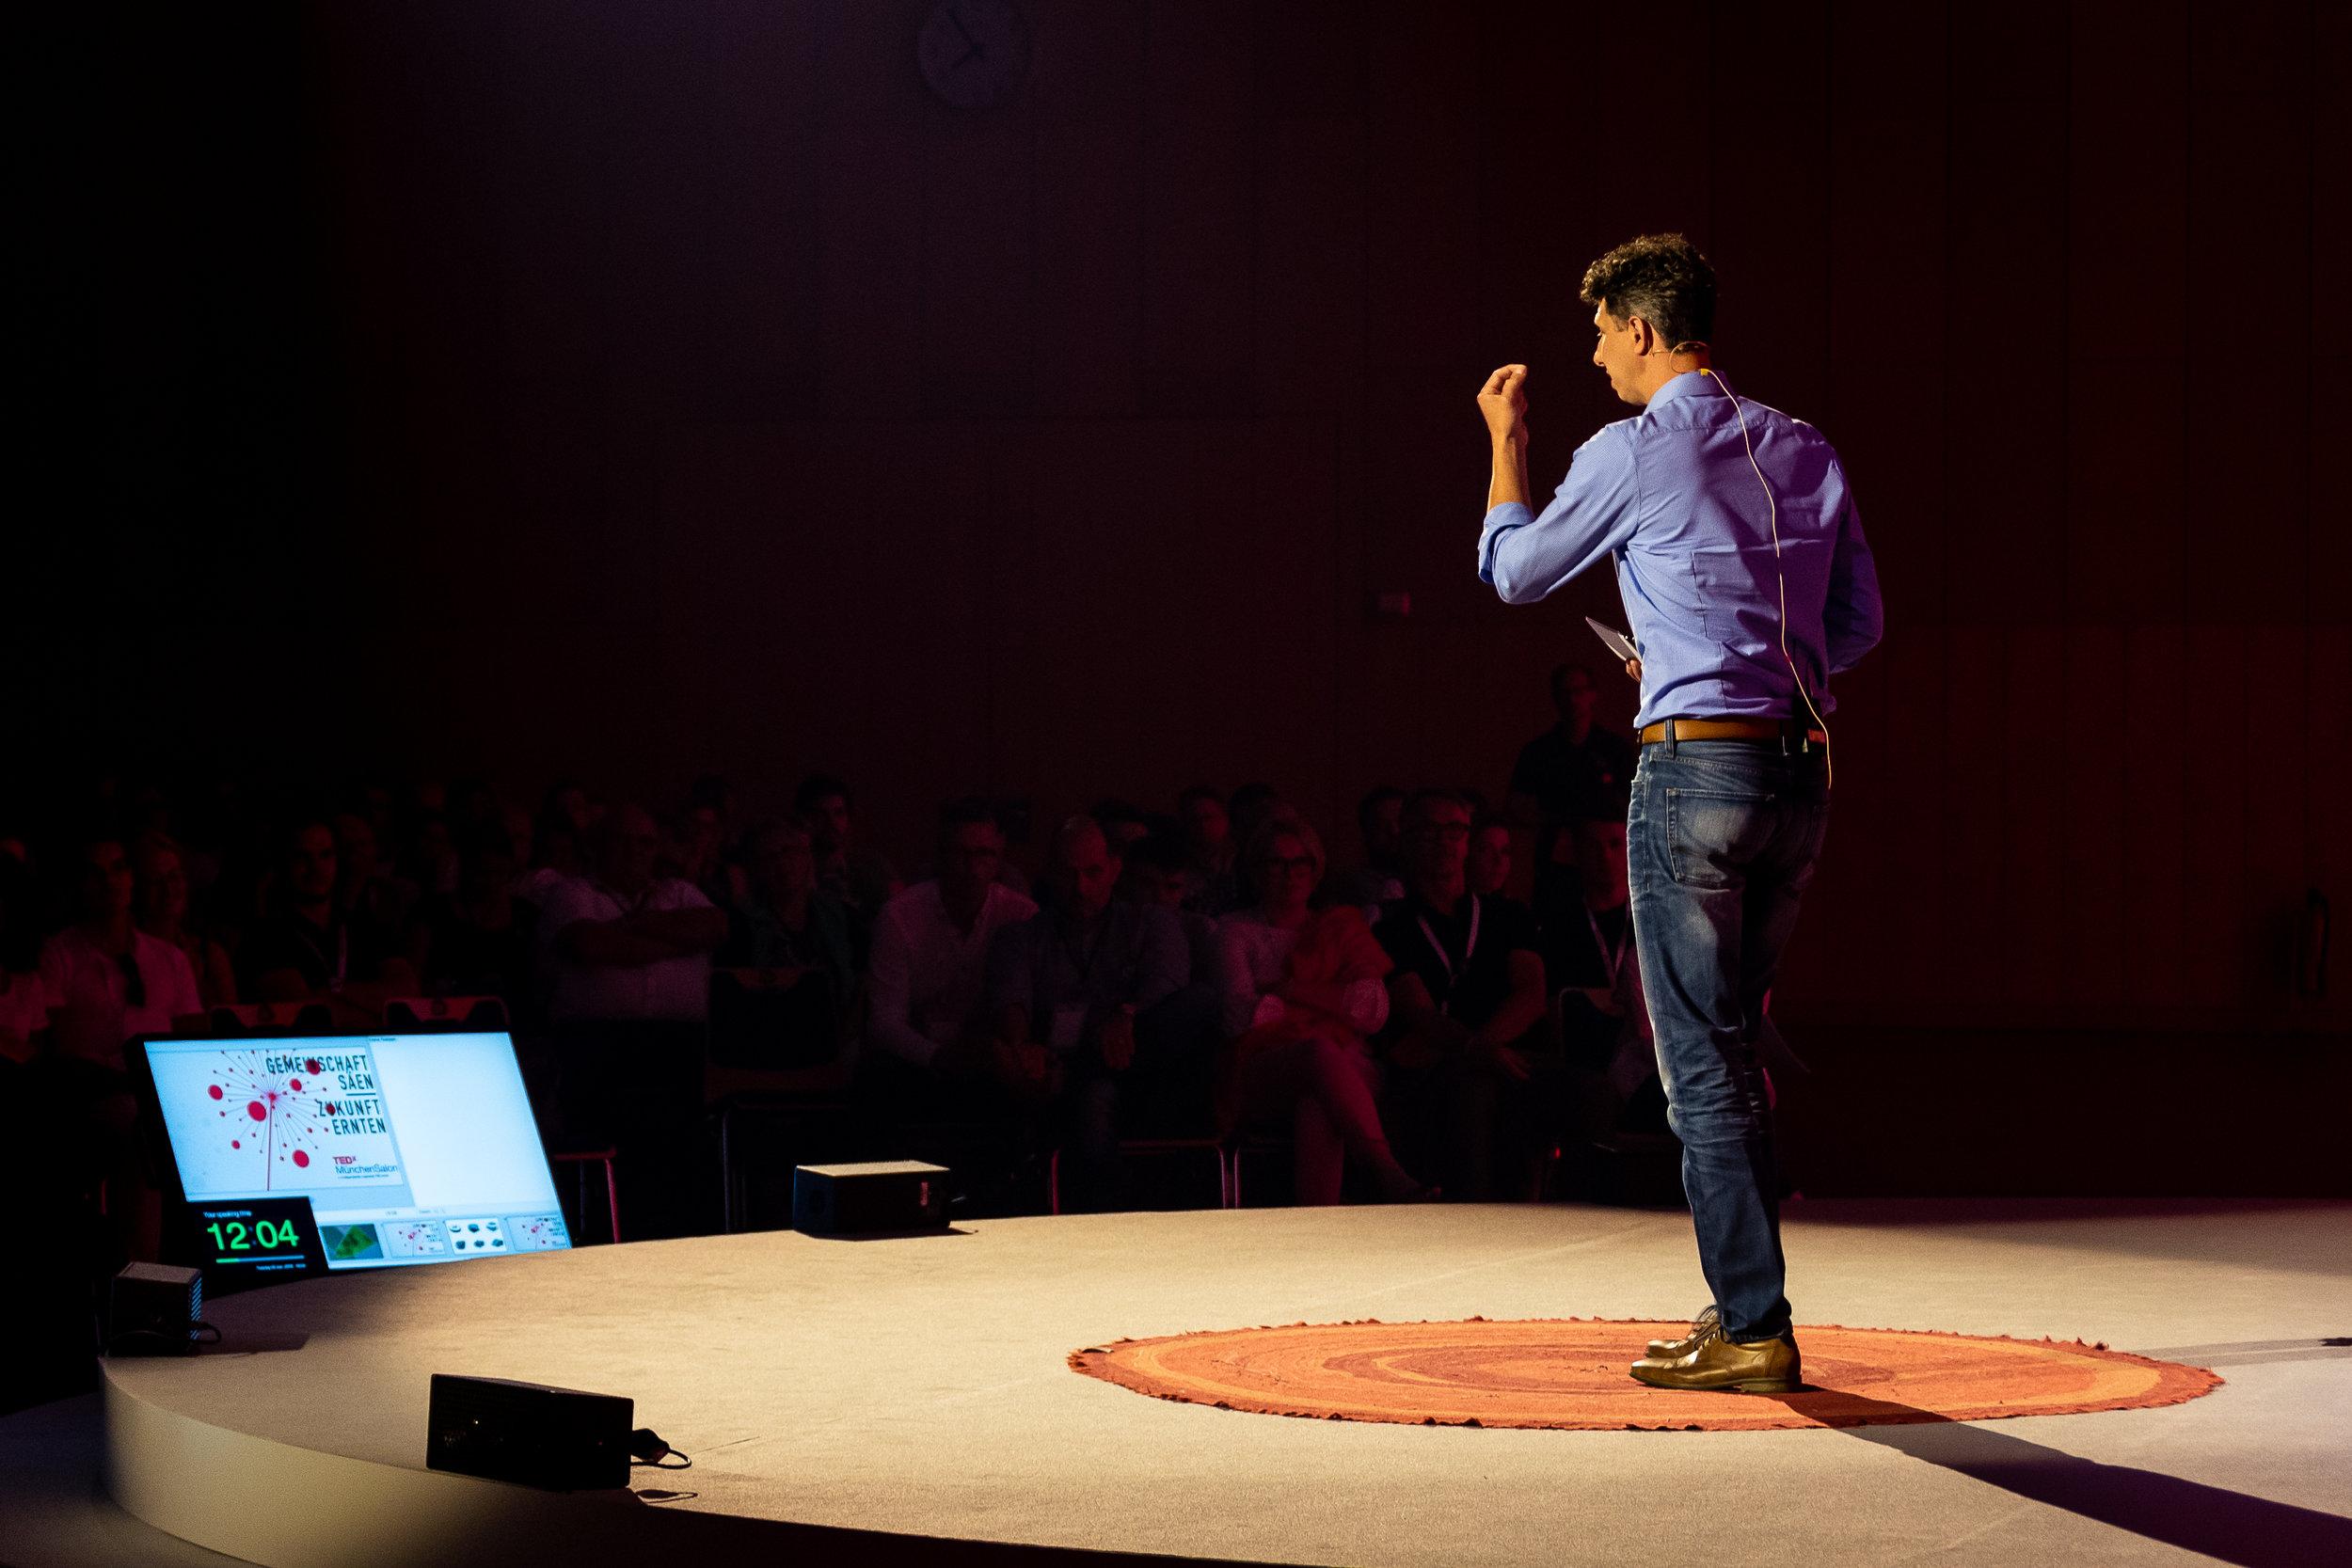 TEDx_MACH-180605-055.jpg